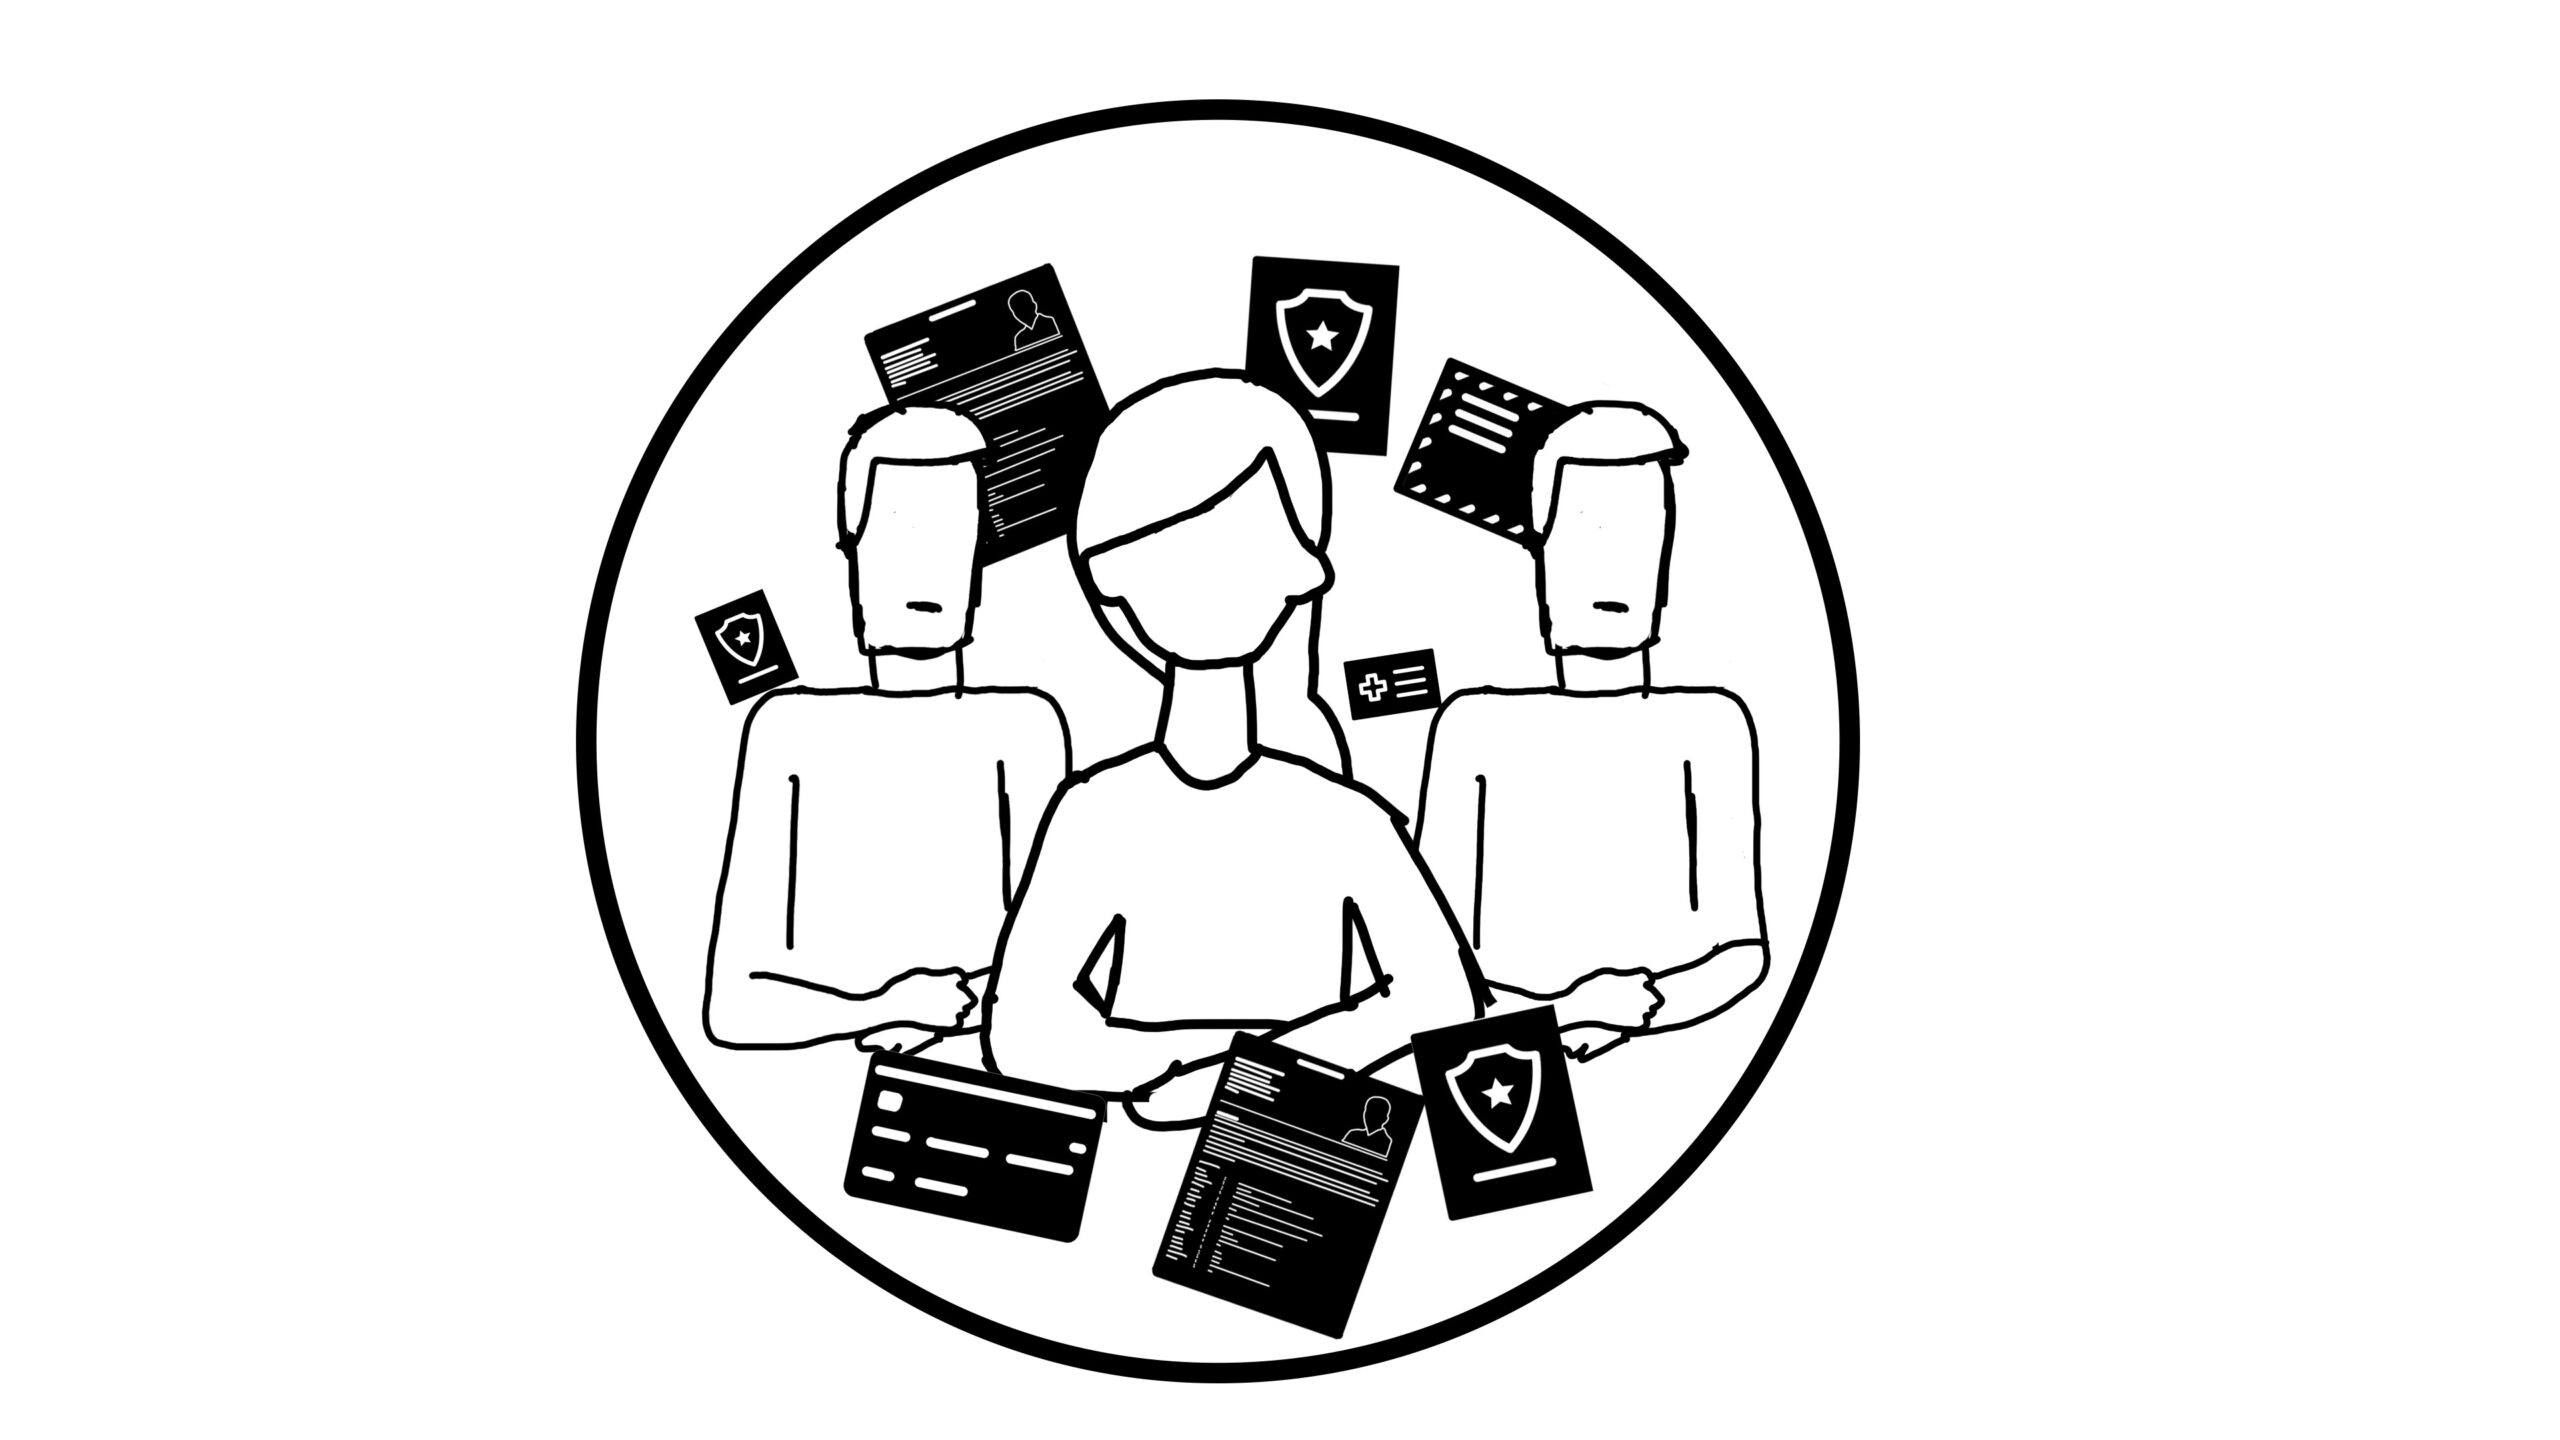 Privacy_Incident_Sketchboard_0310